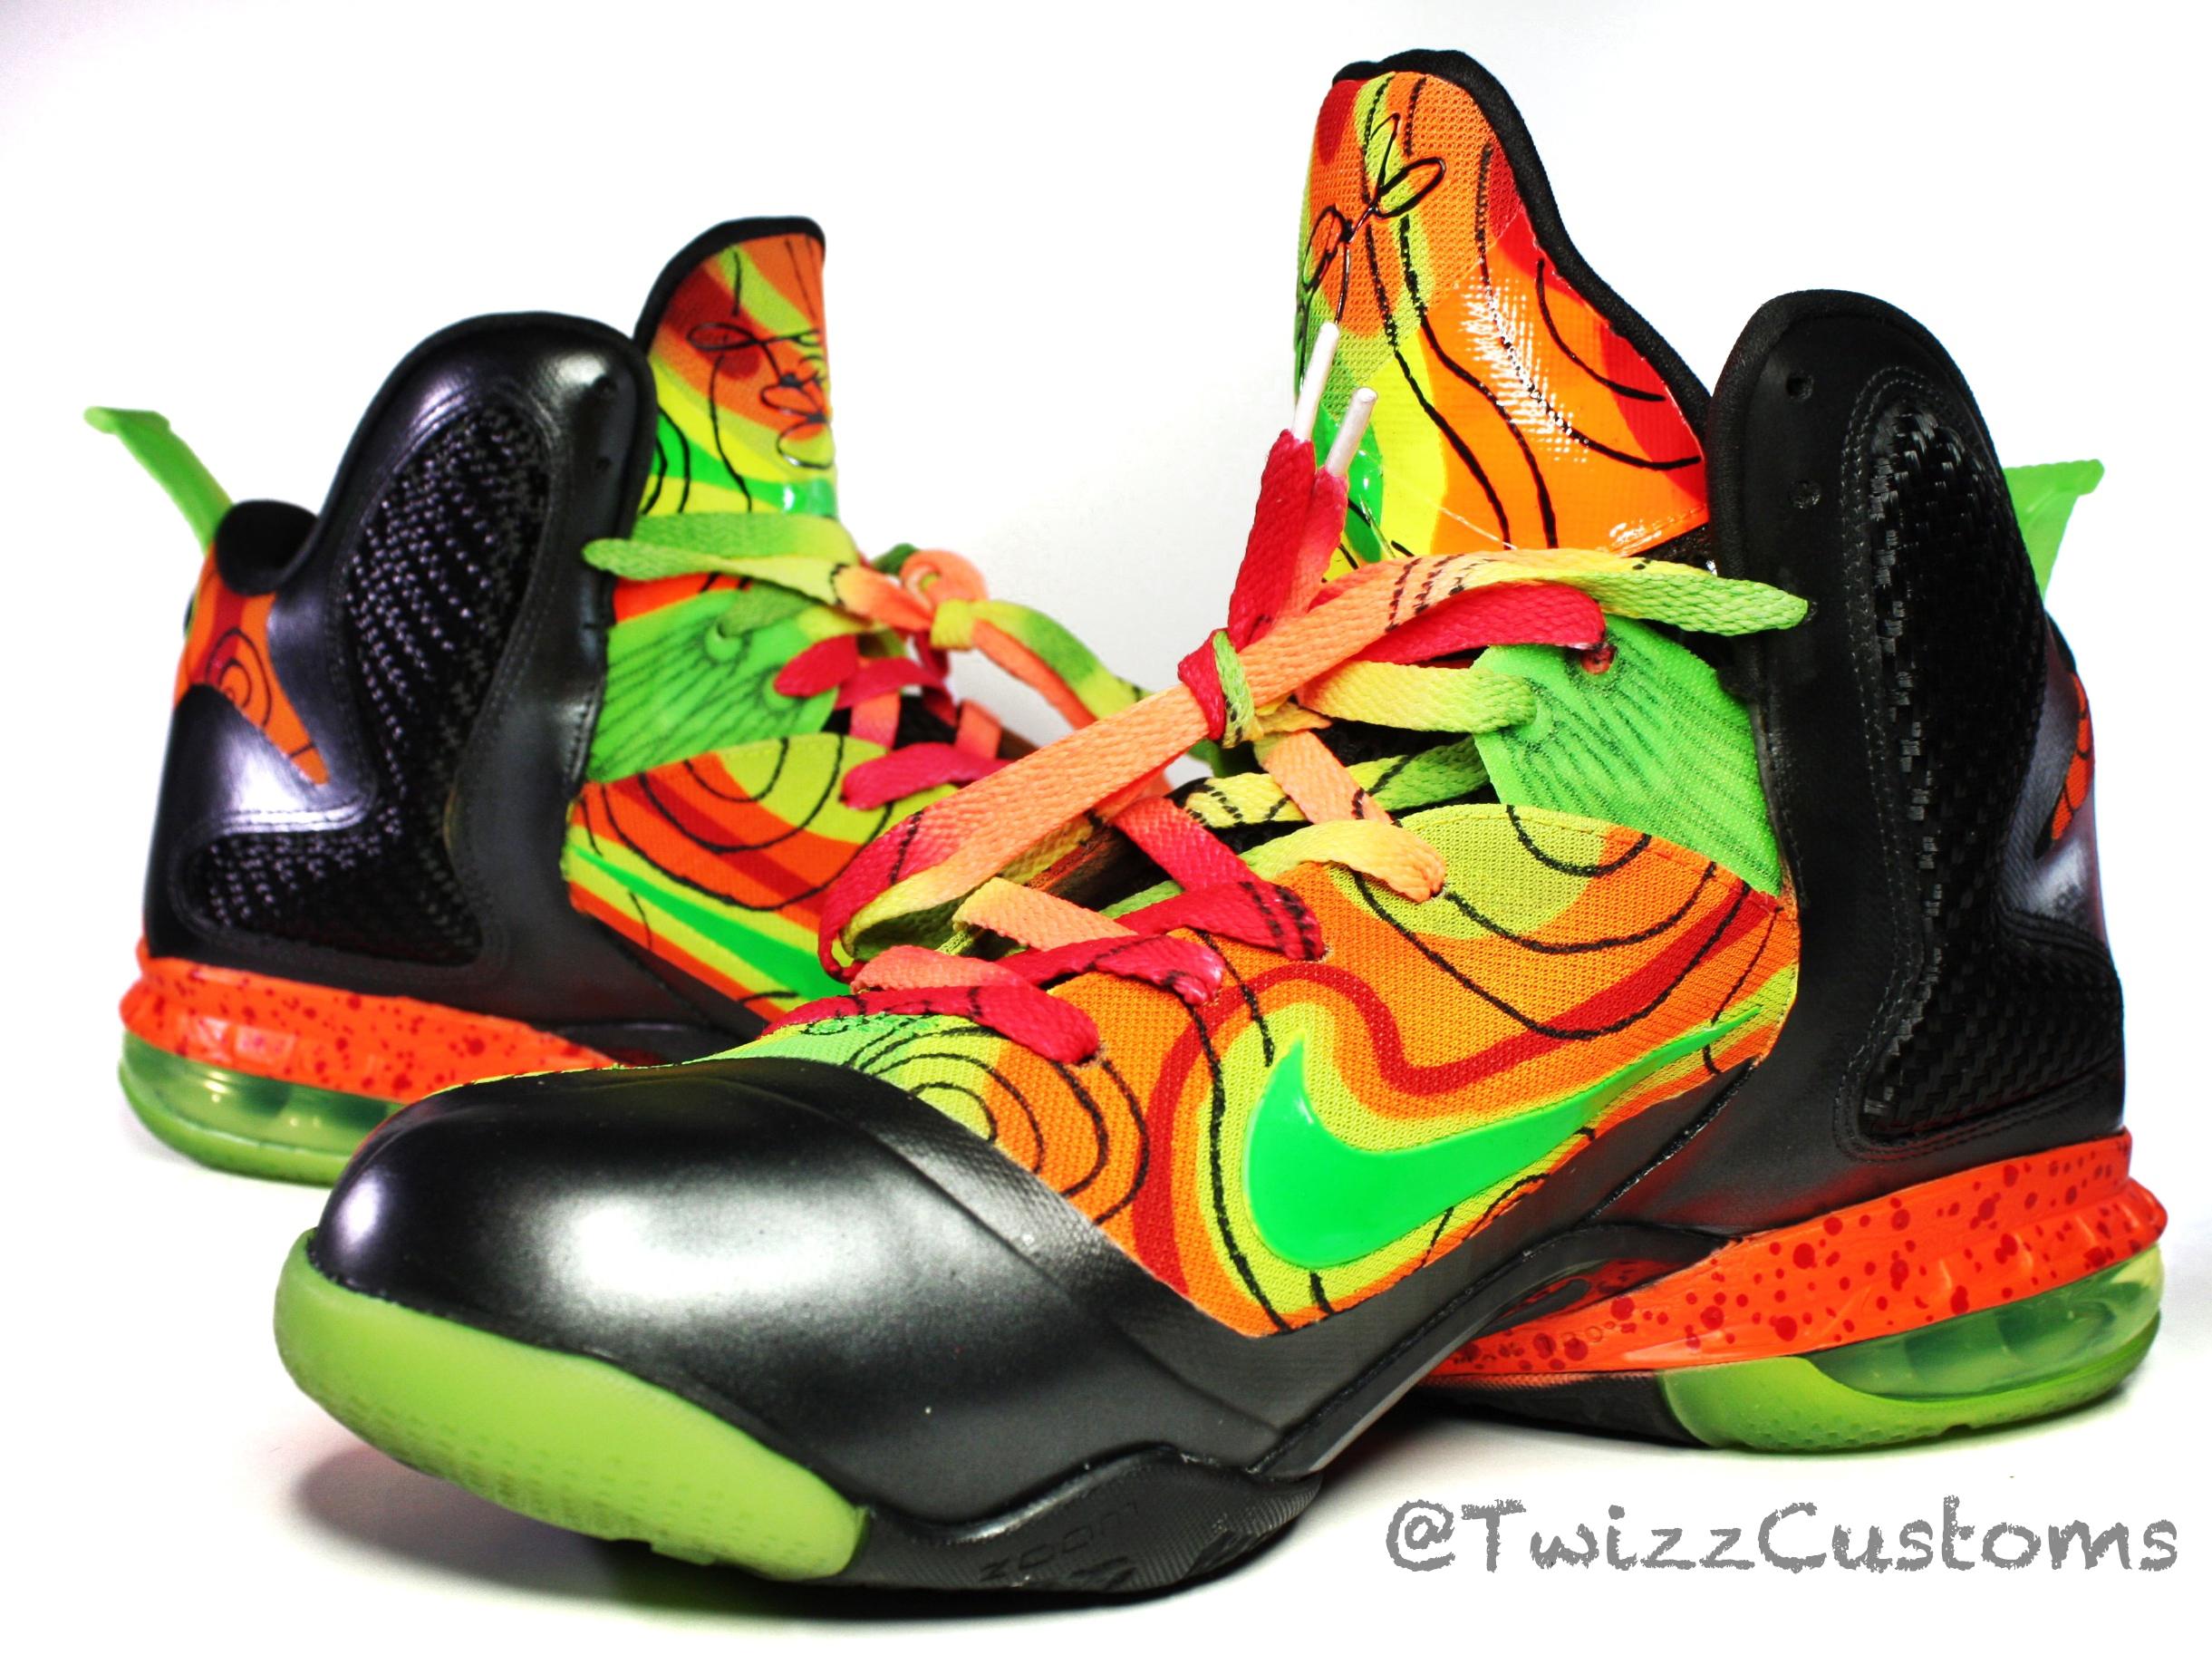 Nike LeBron 9 Weather 'Al Roker' Custom | SneakerFiles